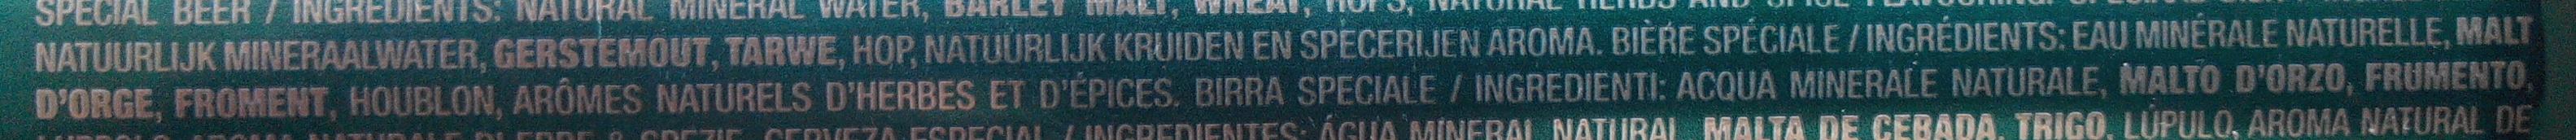 8.6 Absinthe - Ingredients - fr